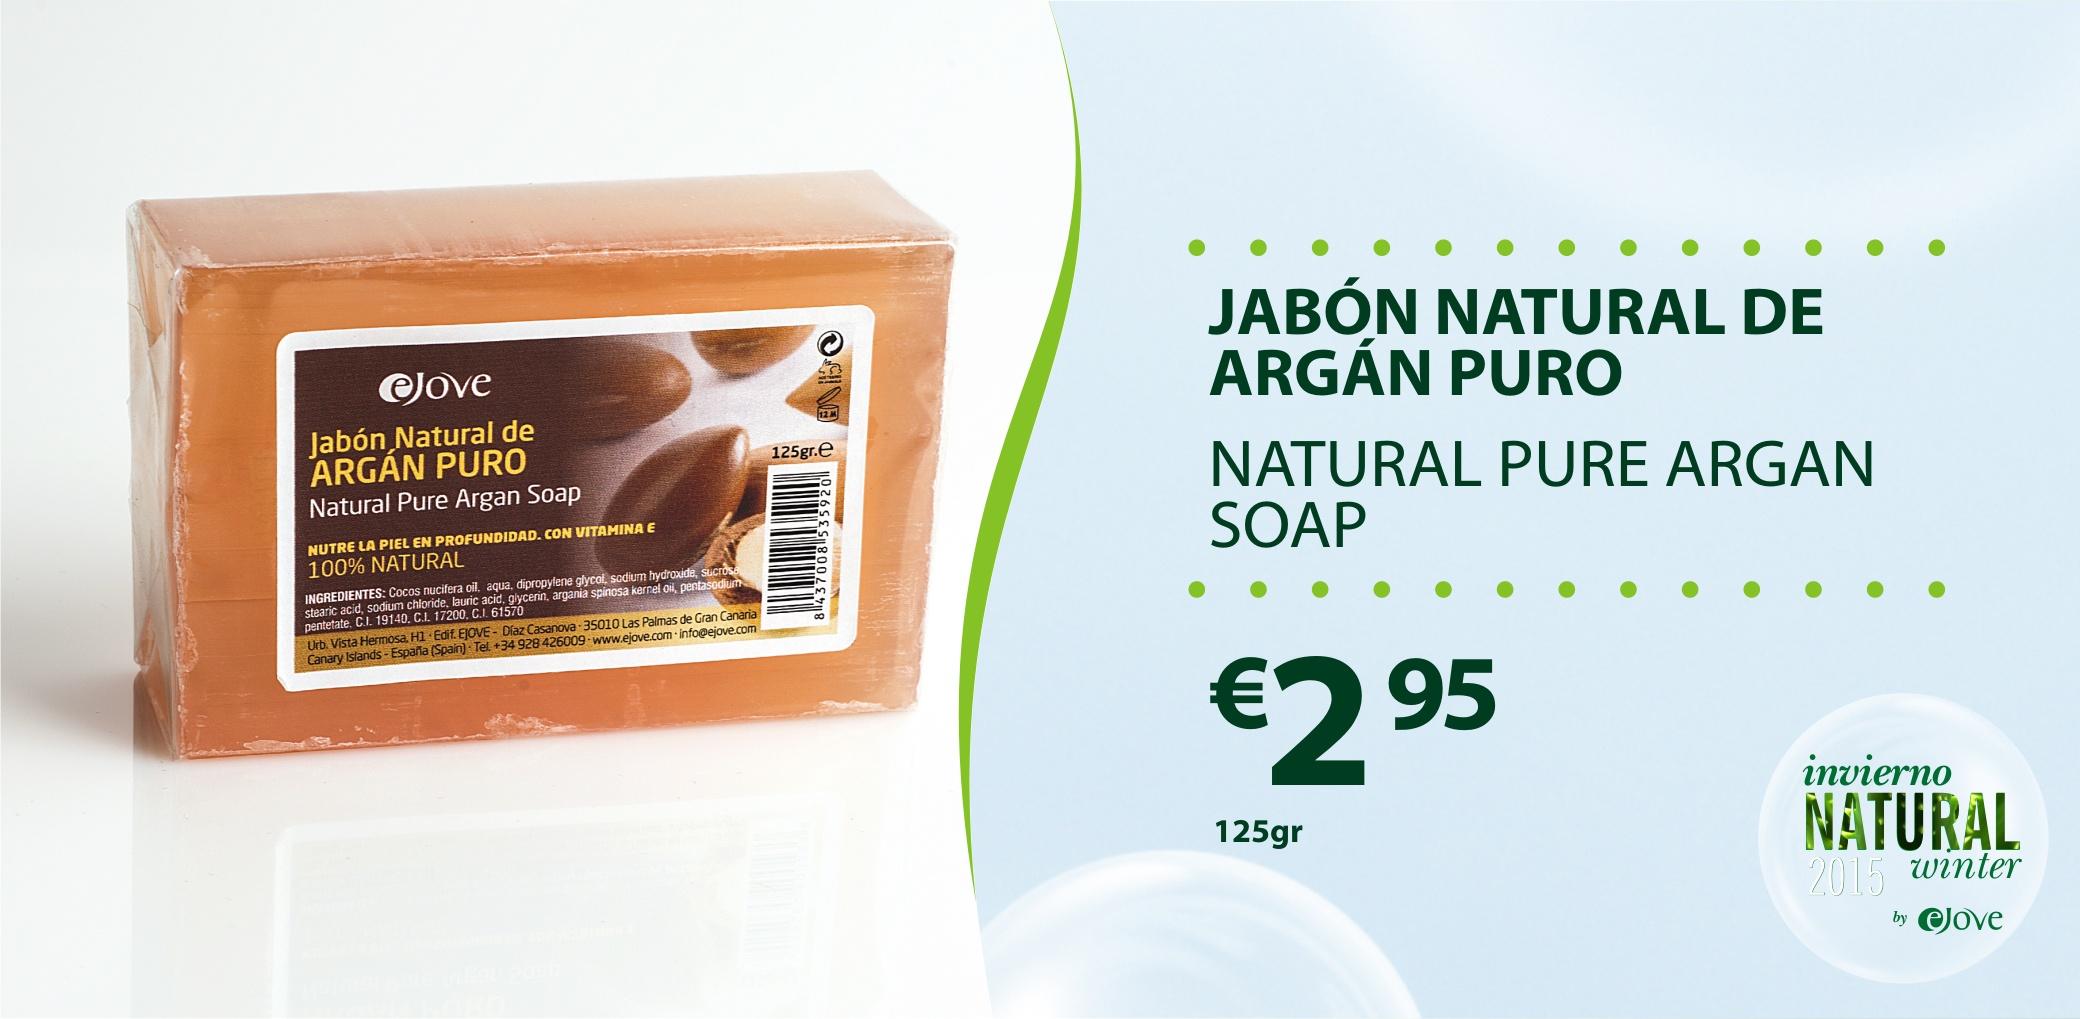 Jabon Argan Puro